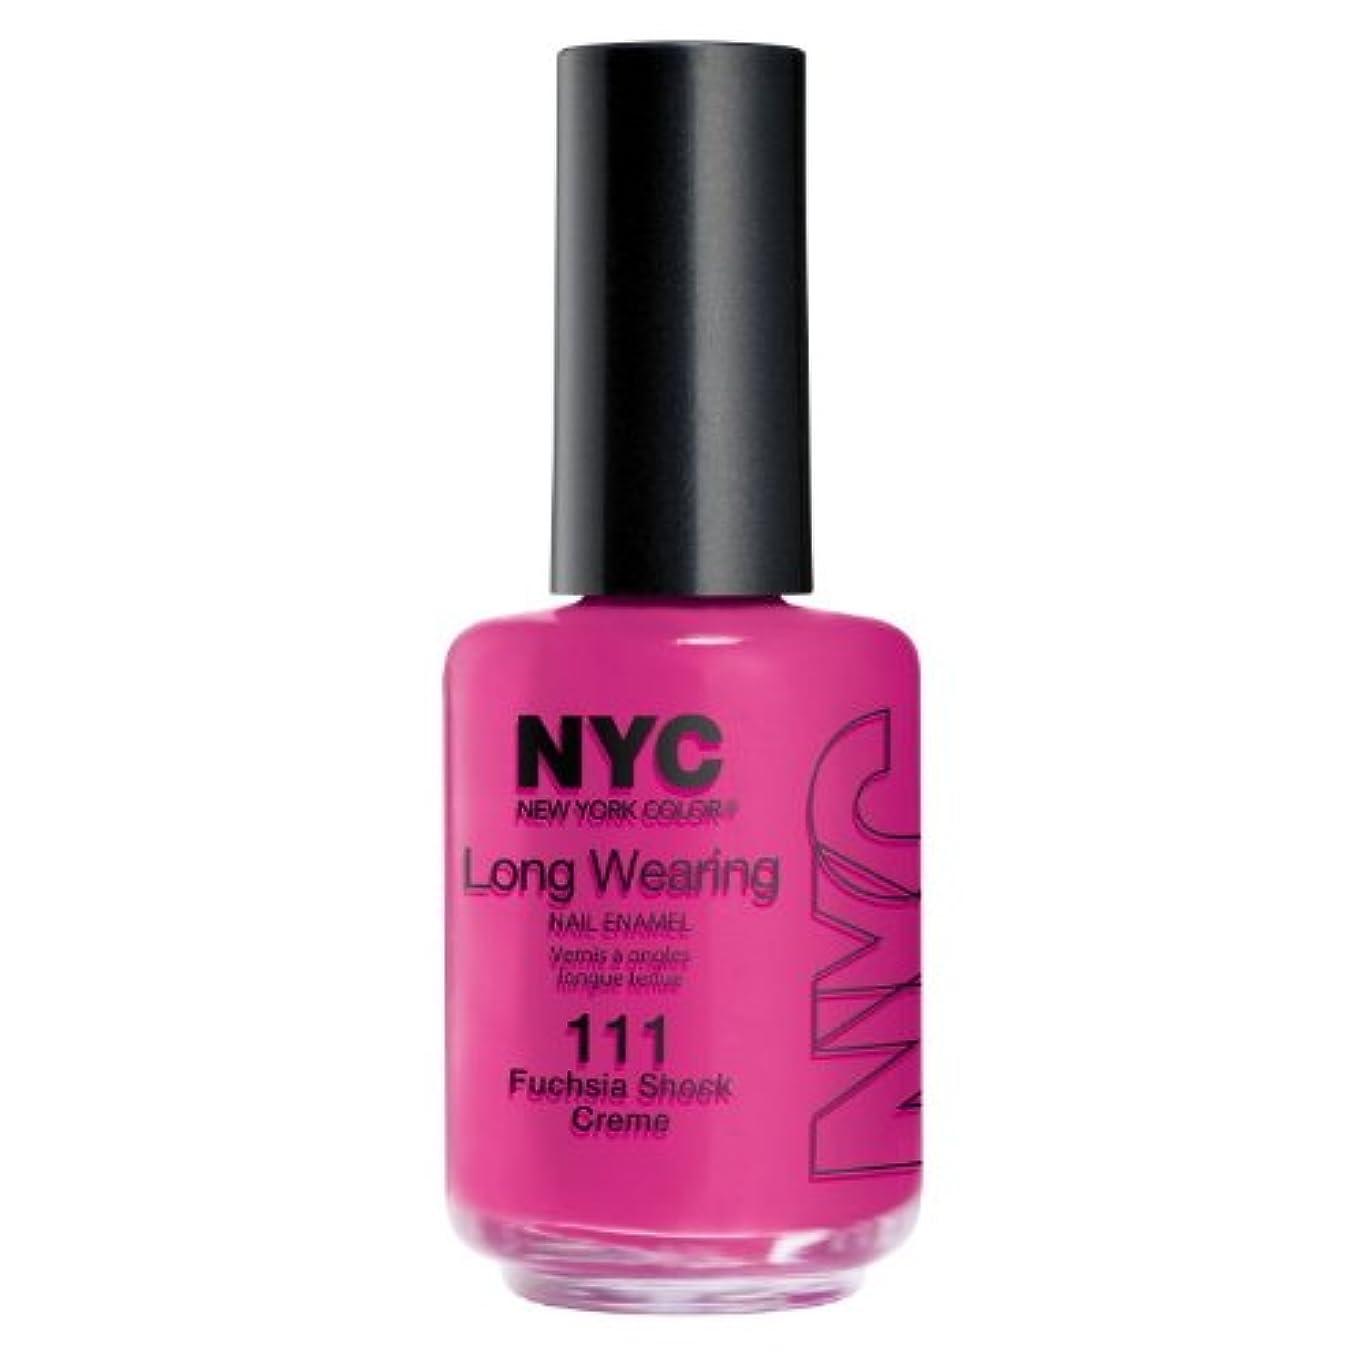 毎日実行可能新年NYC Long Wearing Nail Enamel - Fuchisia Shock Creme (並行輸入品)